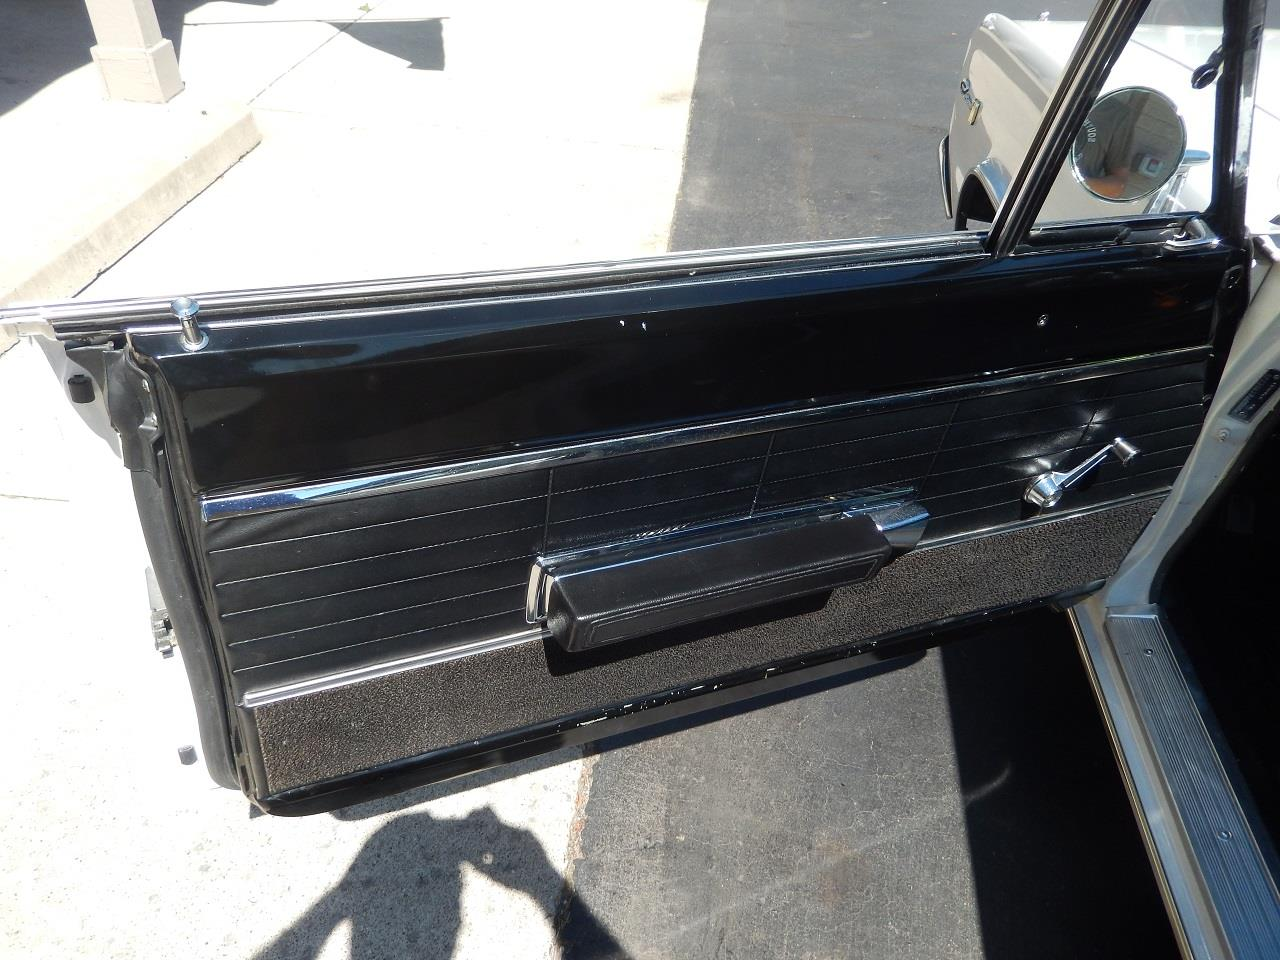 Large Picture of Classic 1966 Coronet 500 located in Michigan - $31,900.00 - QEK3